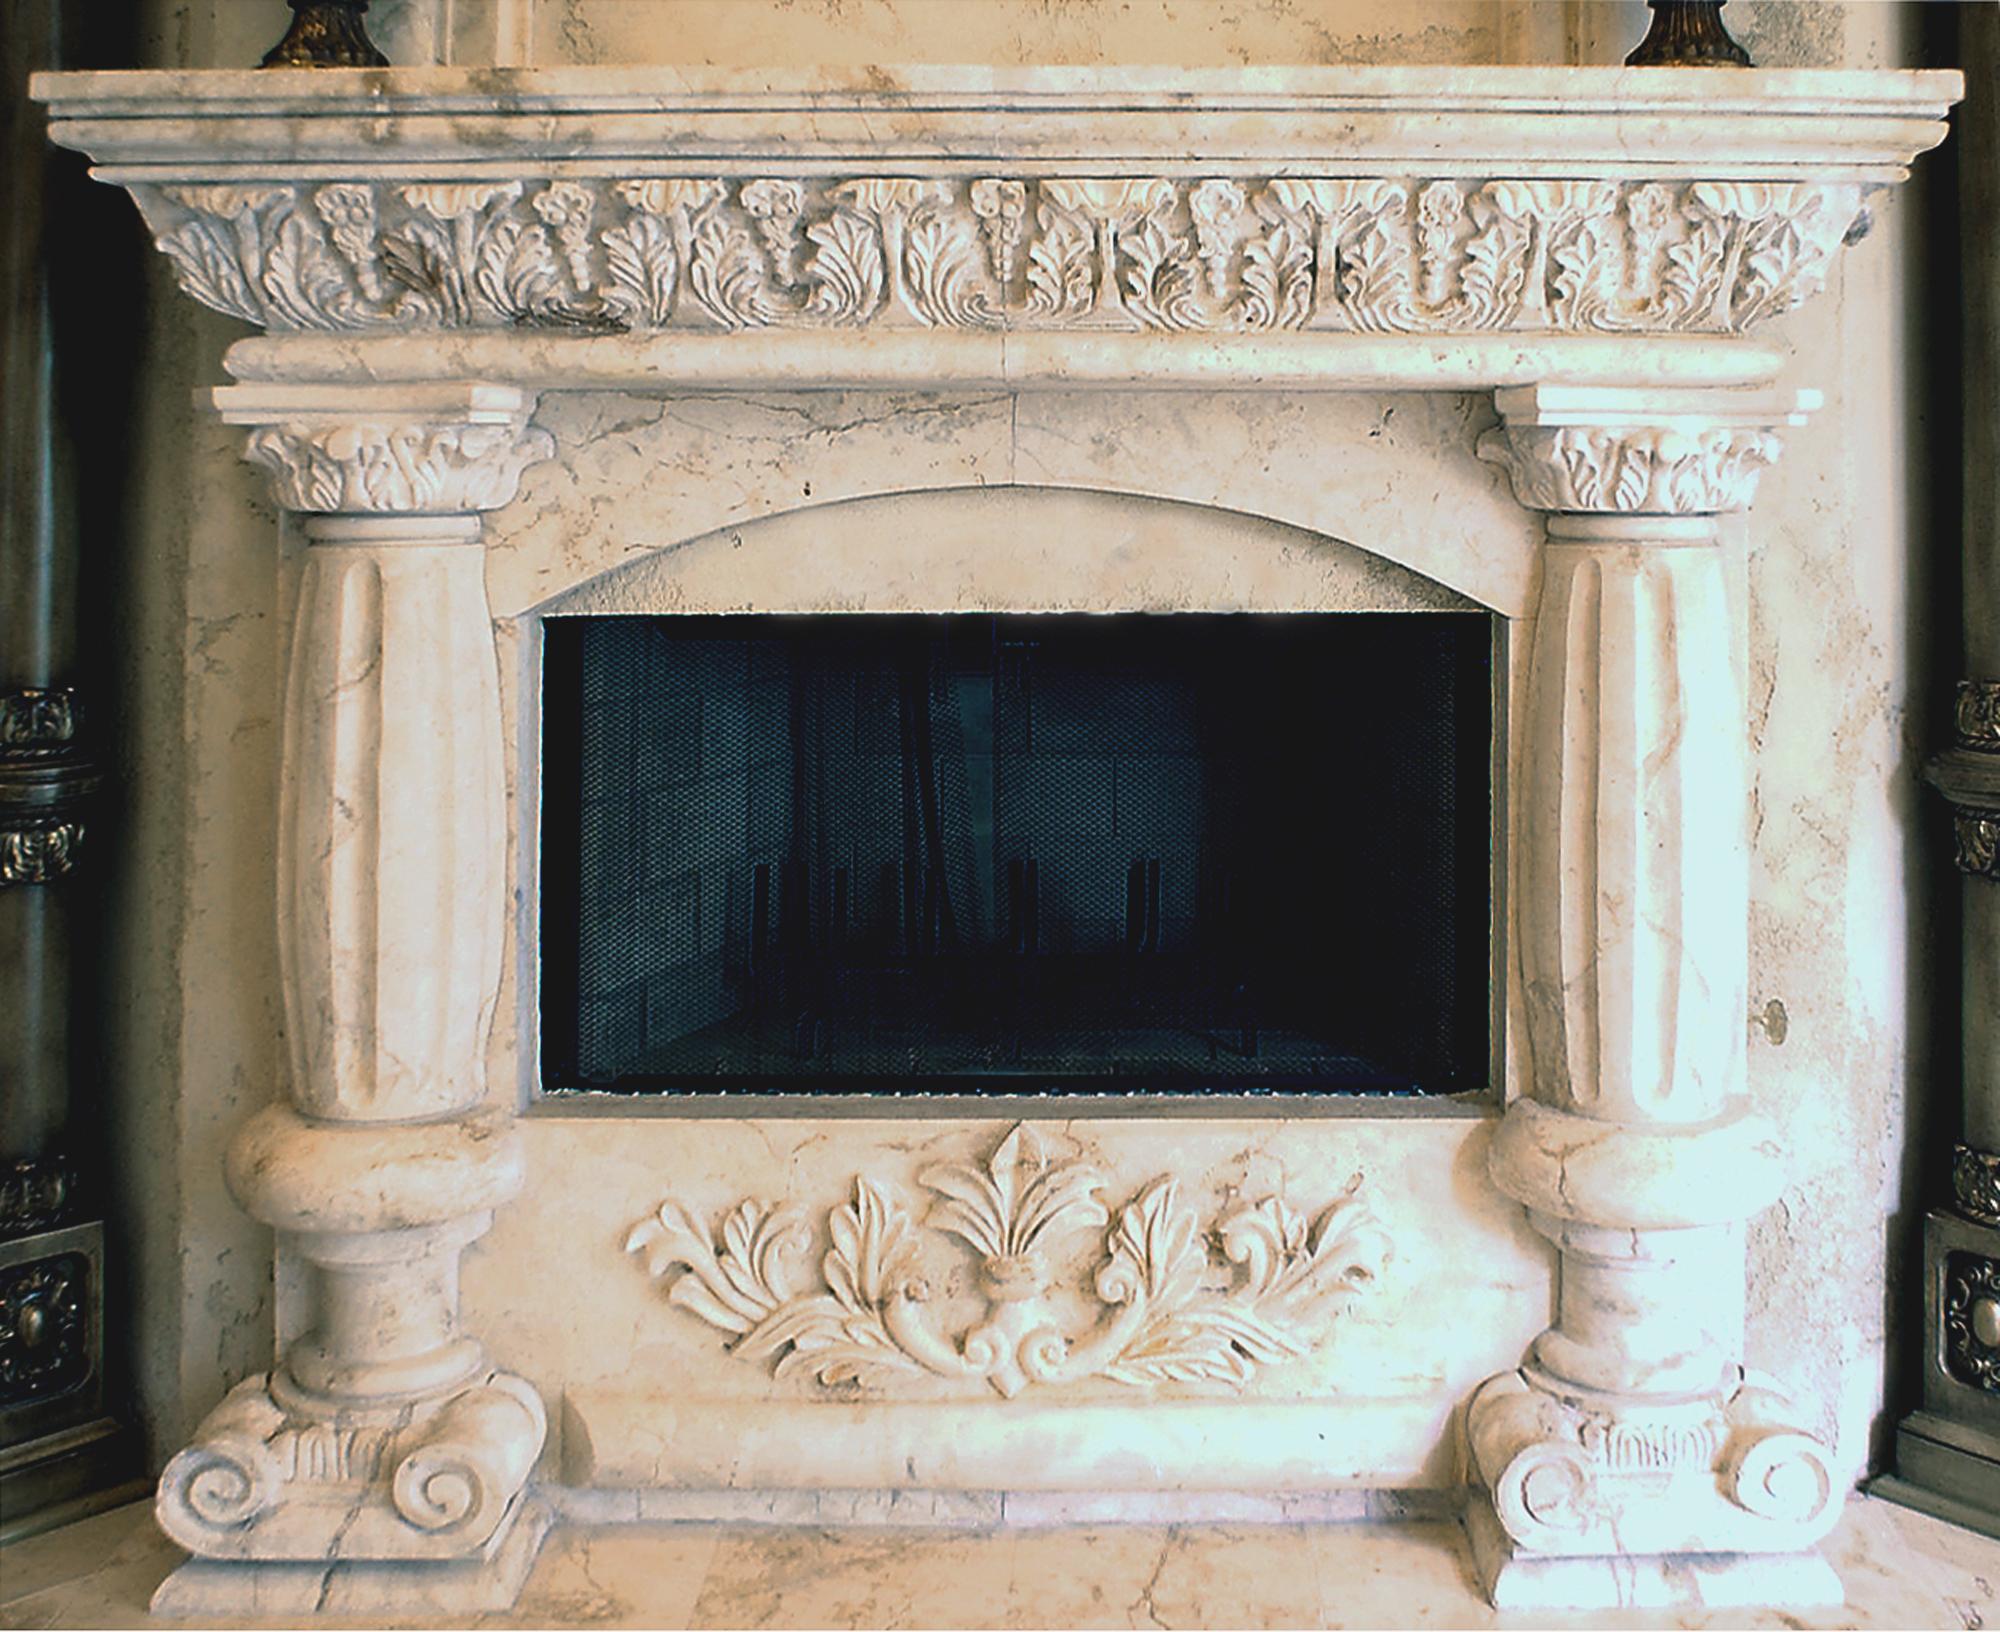 Corinthian I_2000x1632)_Guidry_DSC_0155 Guidry 2 fireplace.jpg